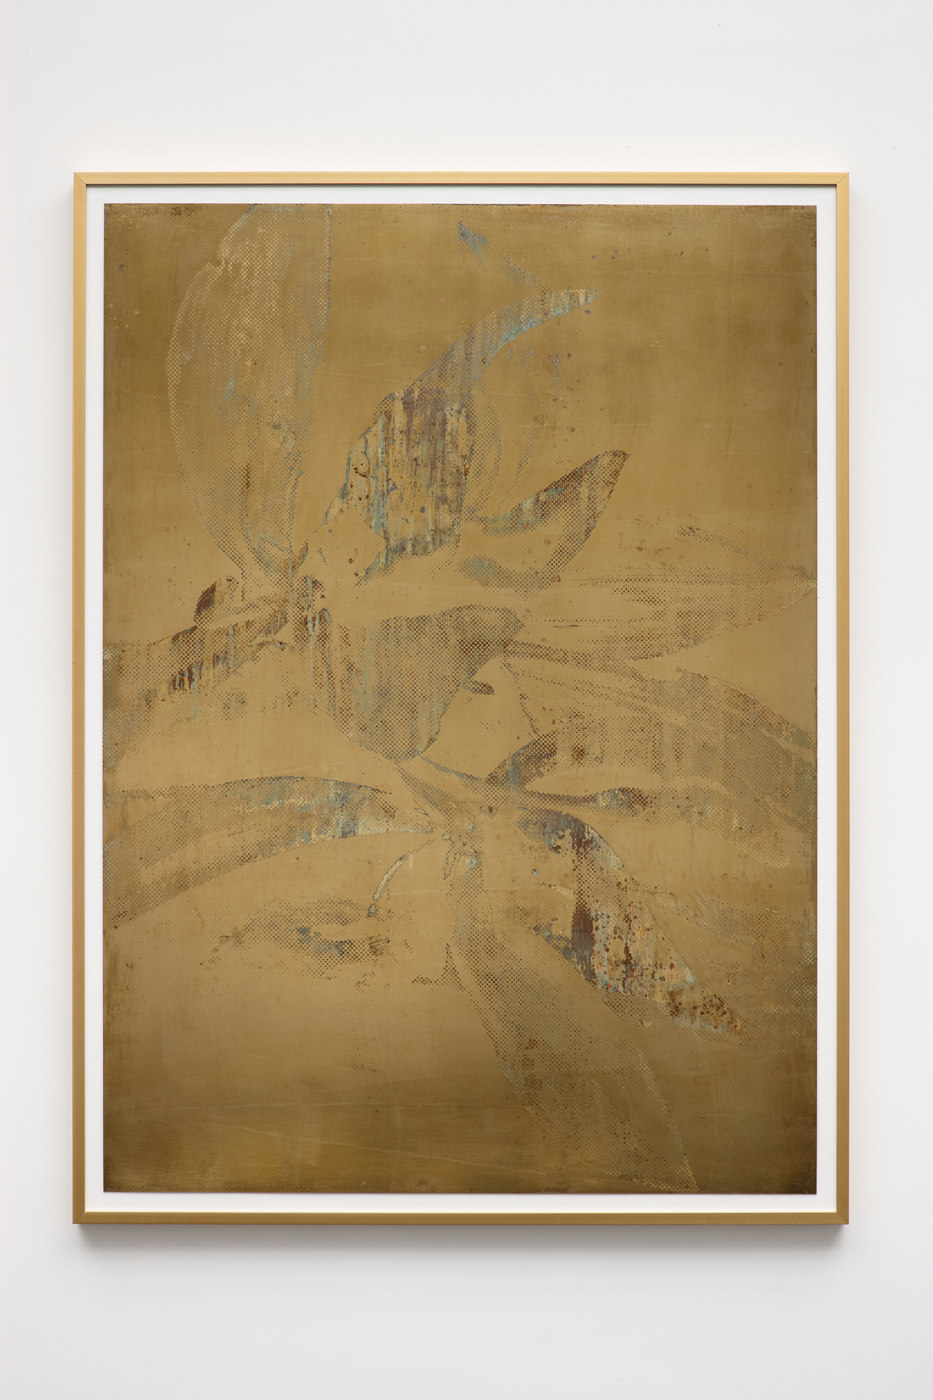 Ross Iannatti - E.C.E no. 42, 2016